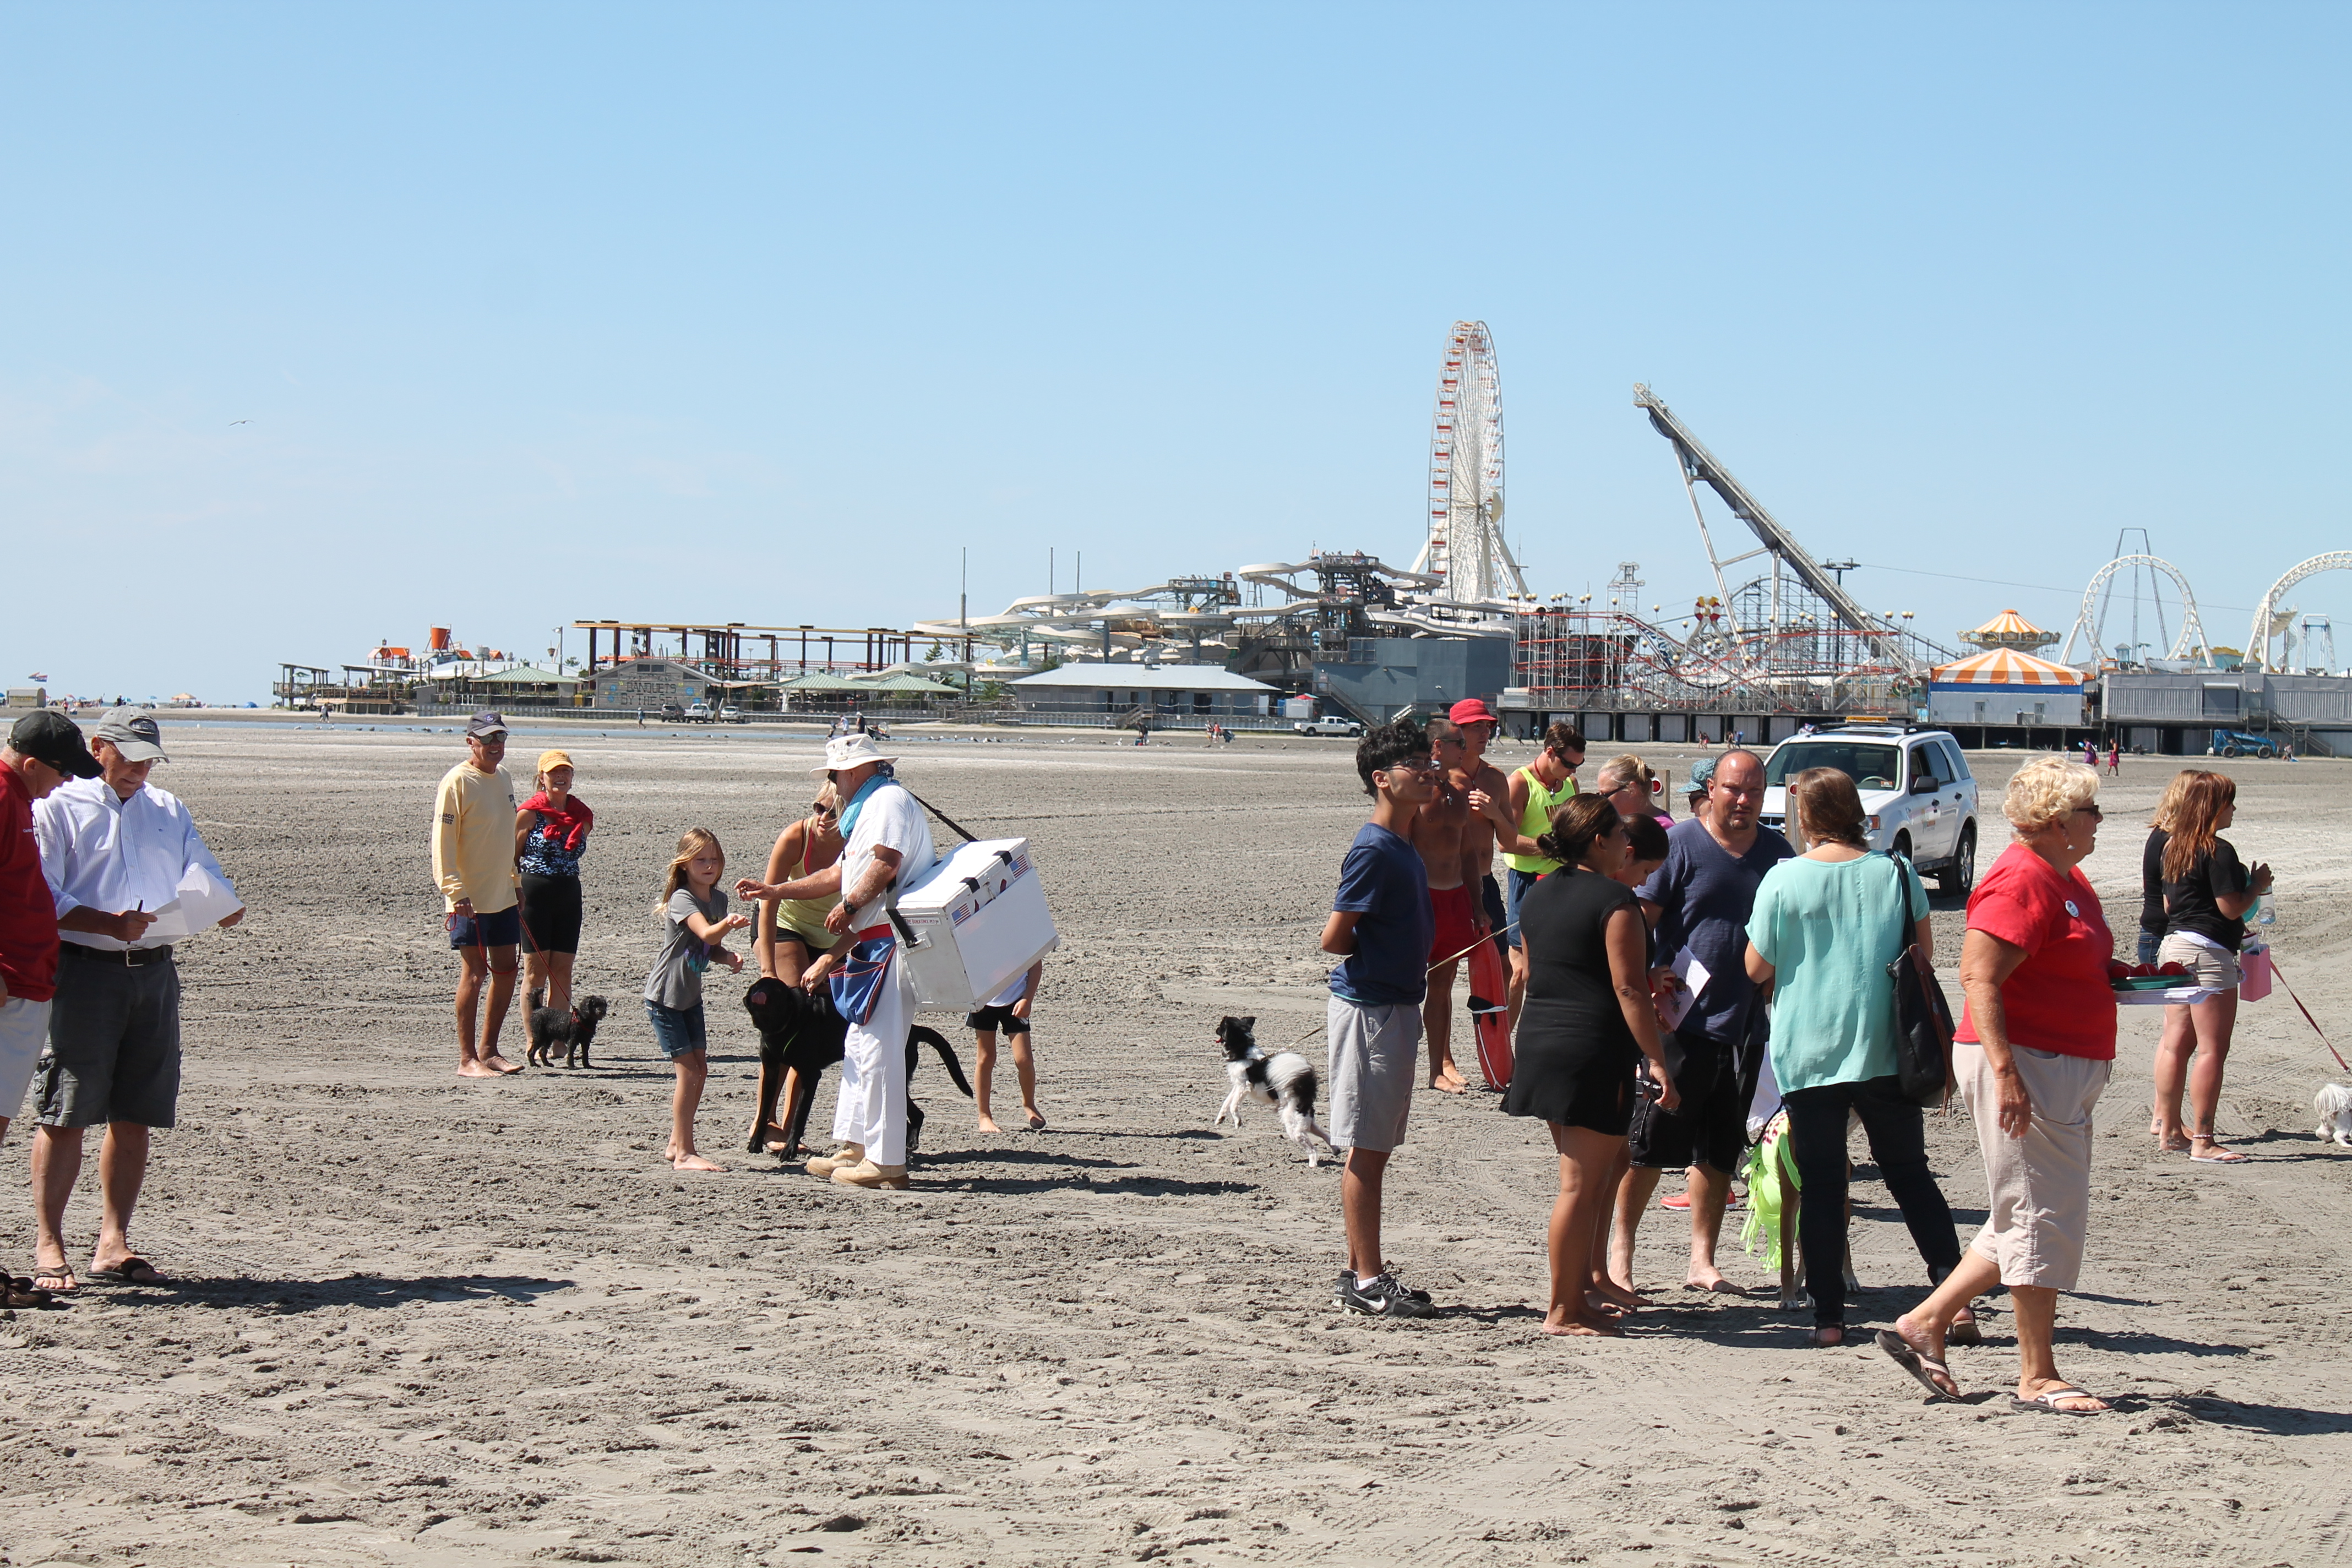 the city of wildwood unveils new dog beach art sculpture at poplar